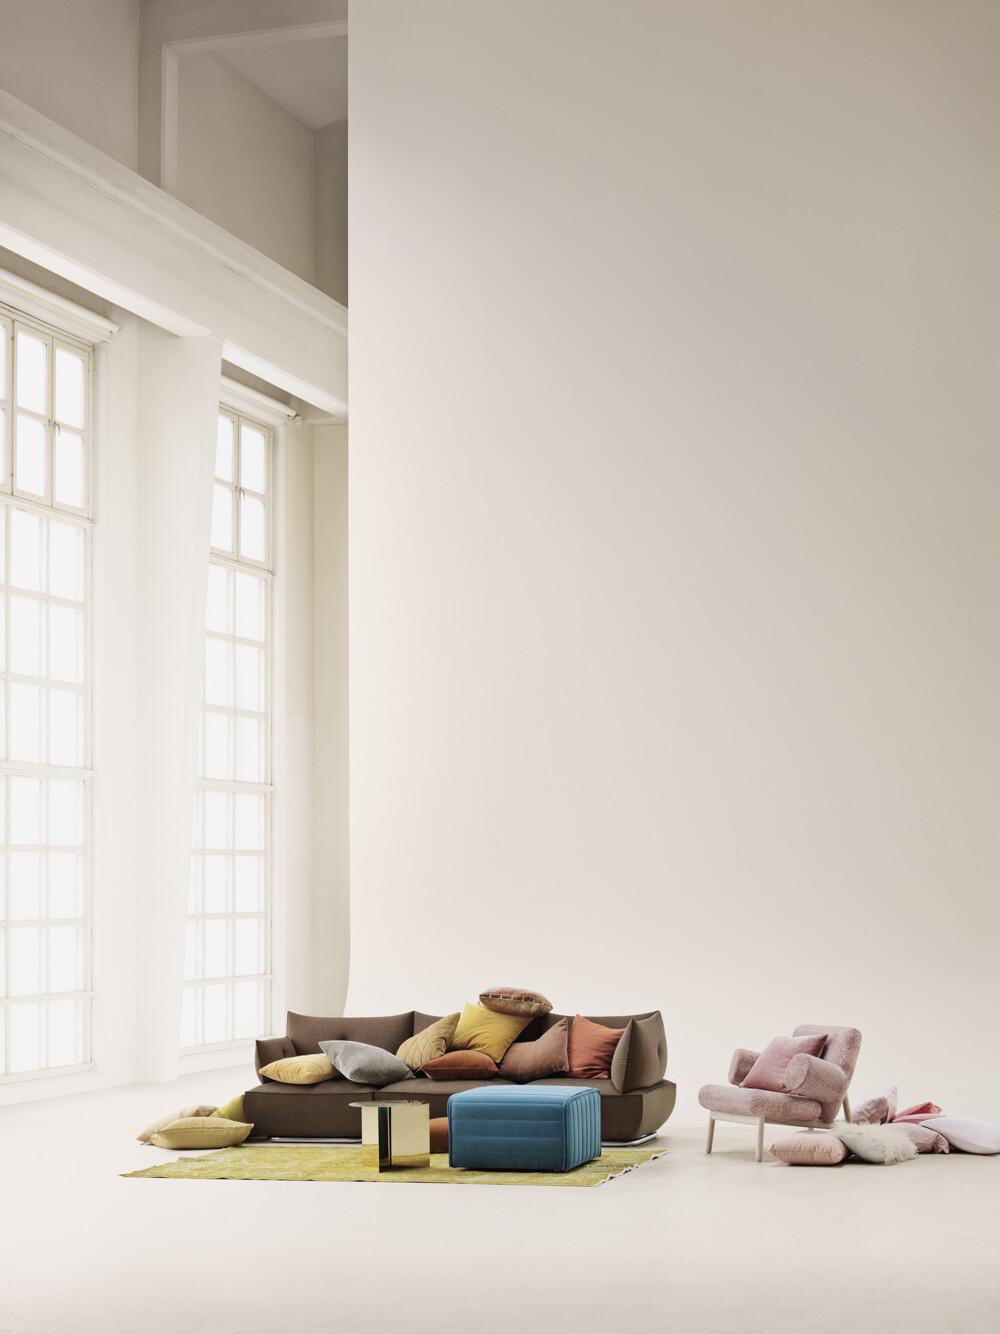 Petrabindel interiors 39cb85c6 w1440